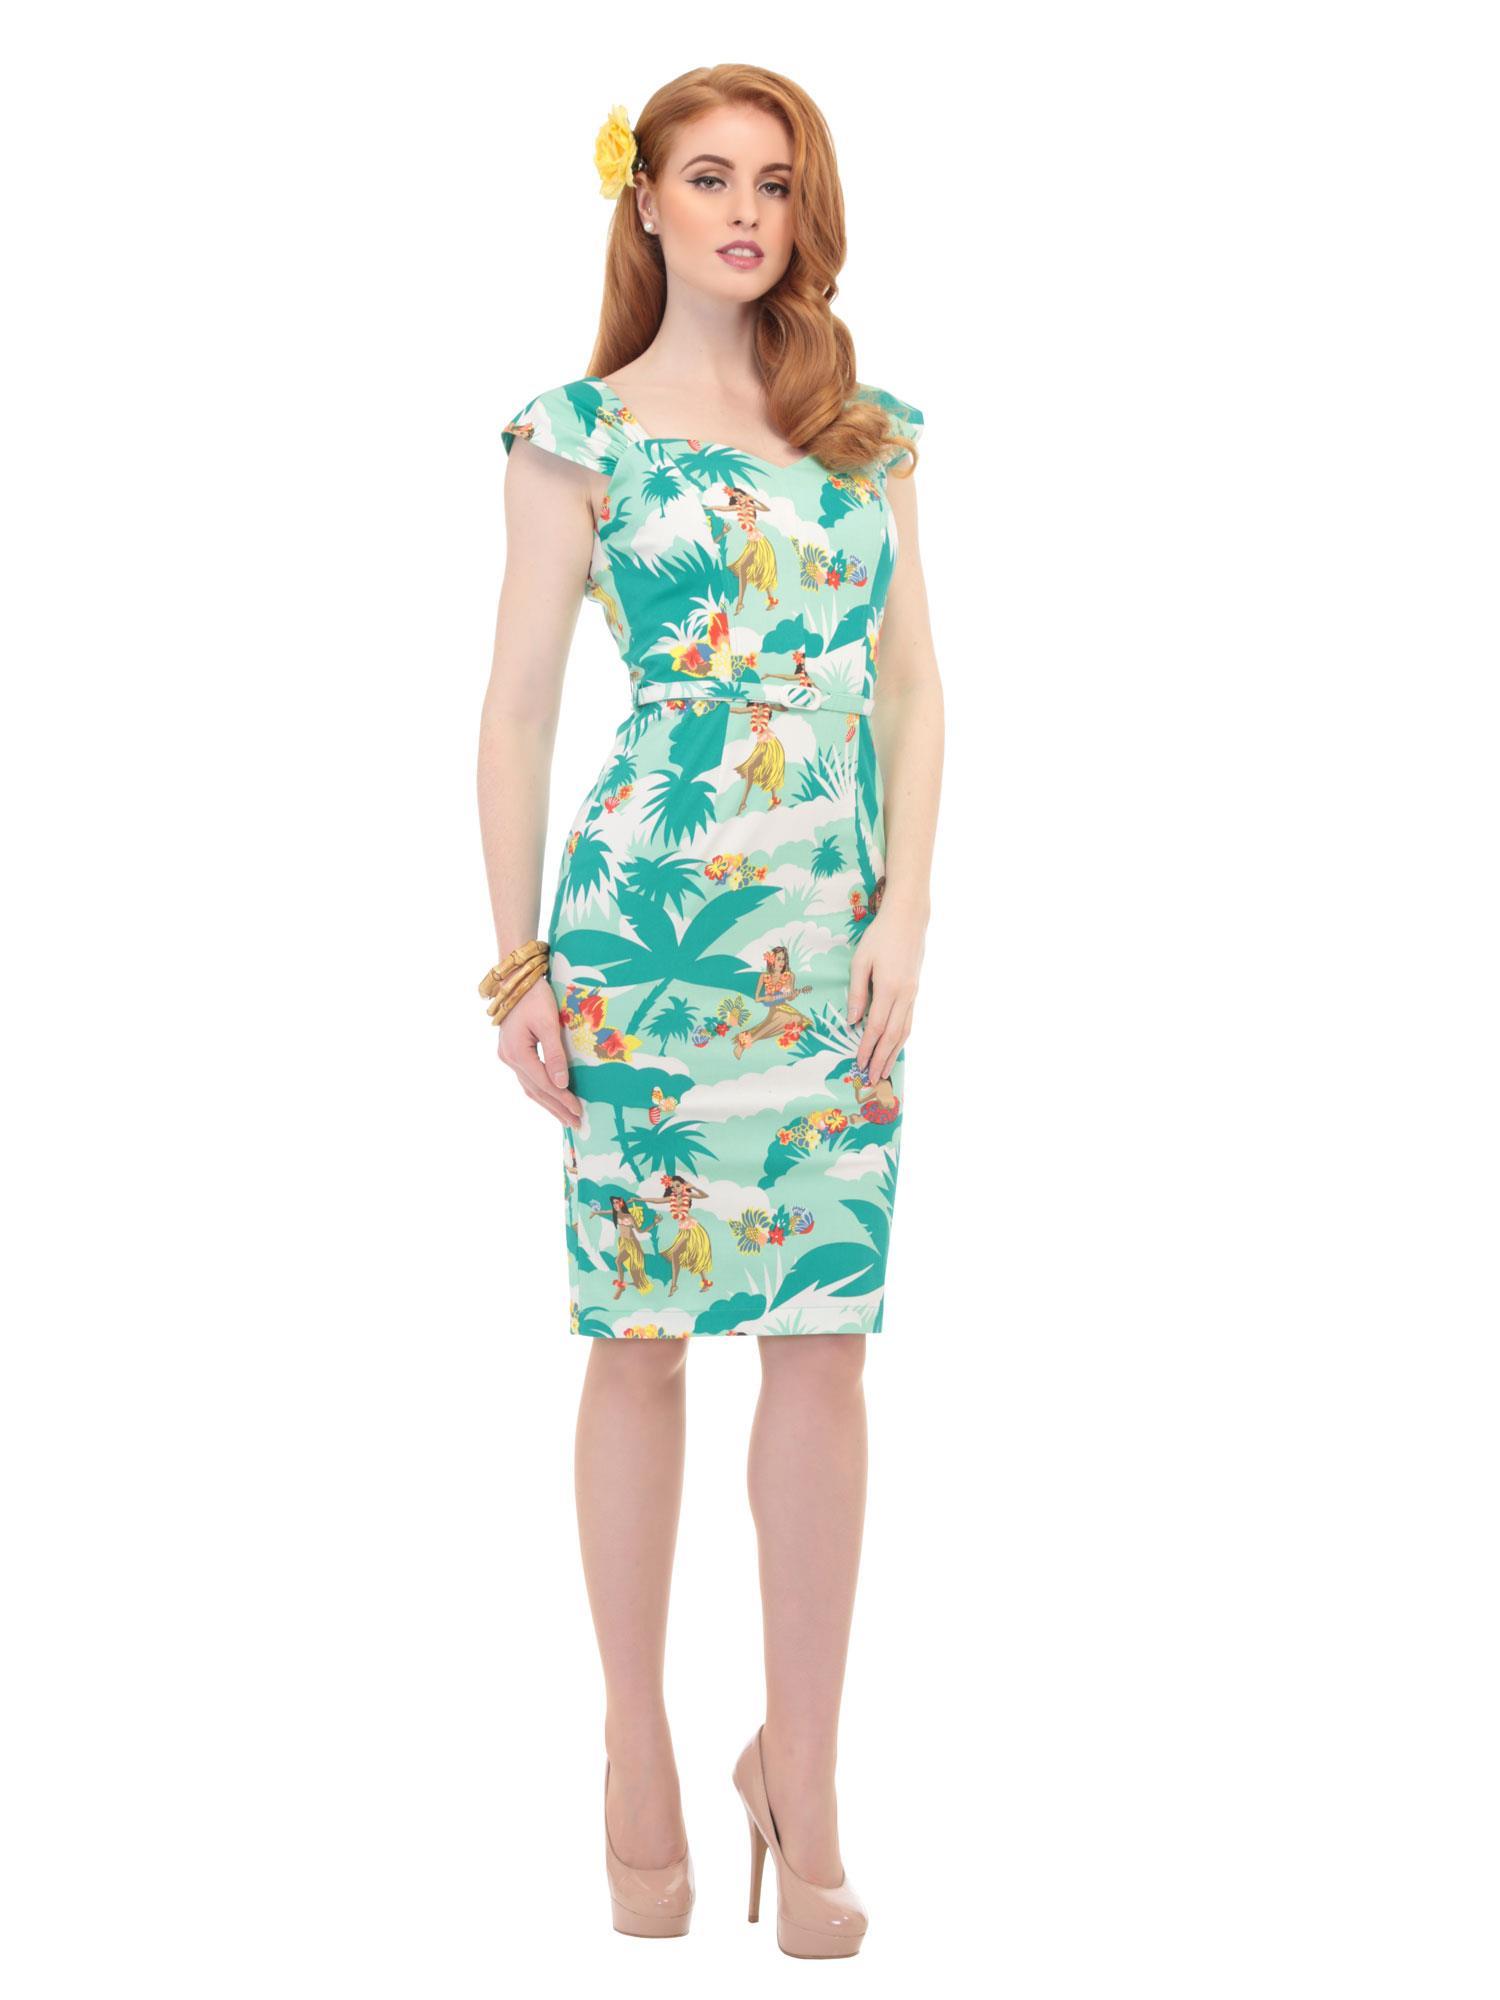 AIDA ZAK COLLECTIF SANDRA HAWAIIAN PRINT DRESS GREEN BLUE SZ 8-22 ...